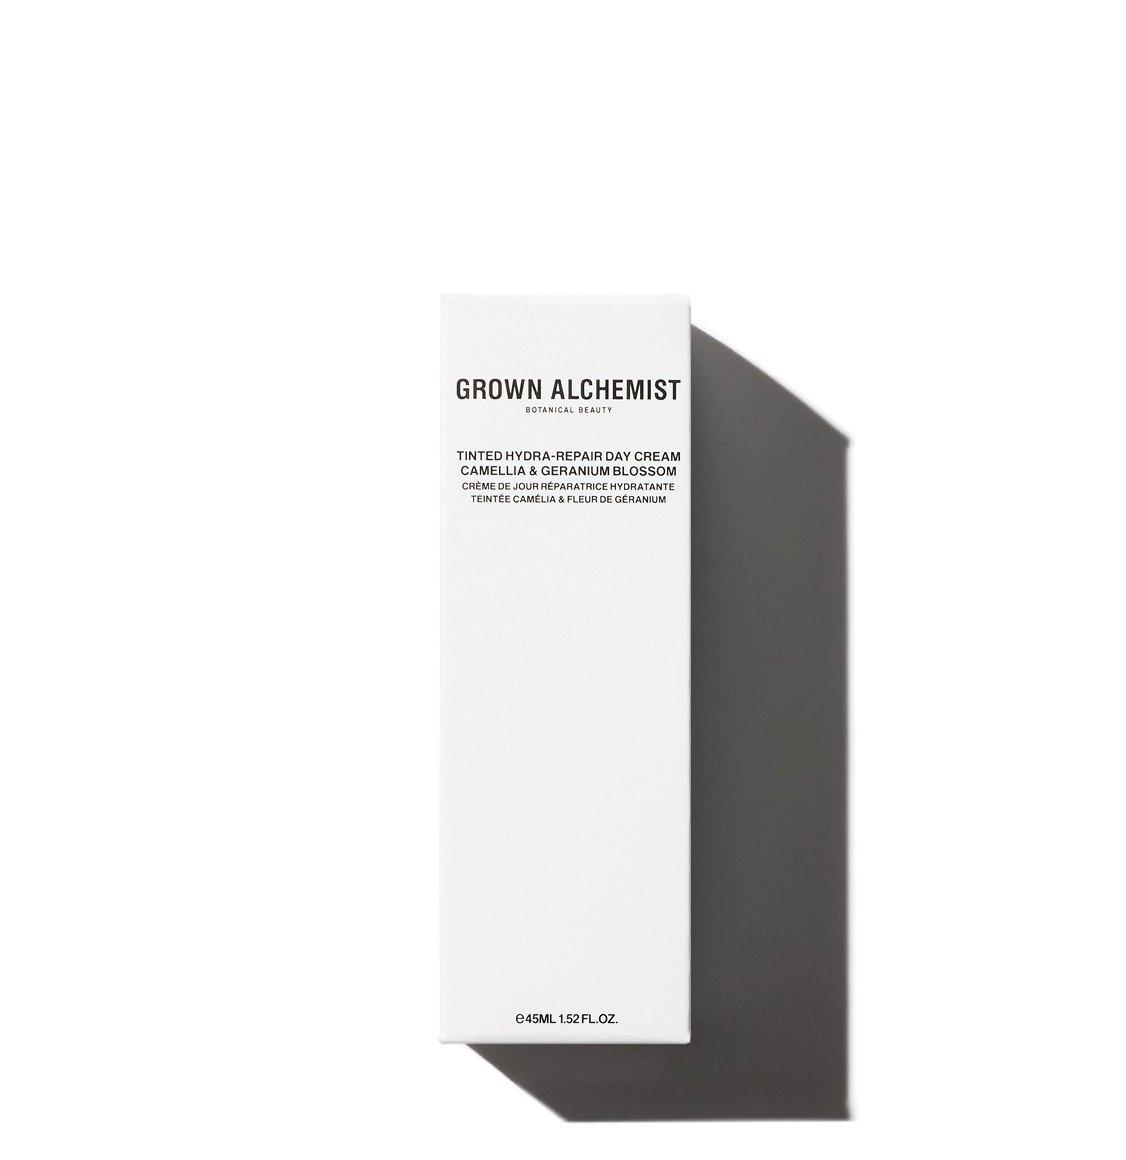 Grown Alchemist Tinted Hydra-Repair Day Face Cream 45ml